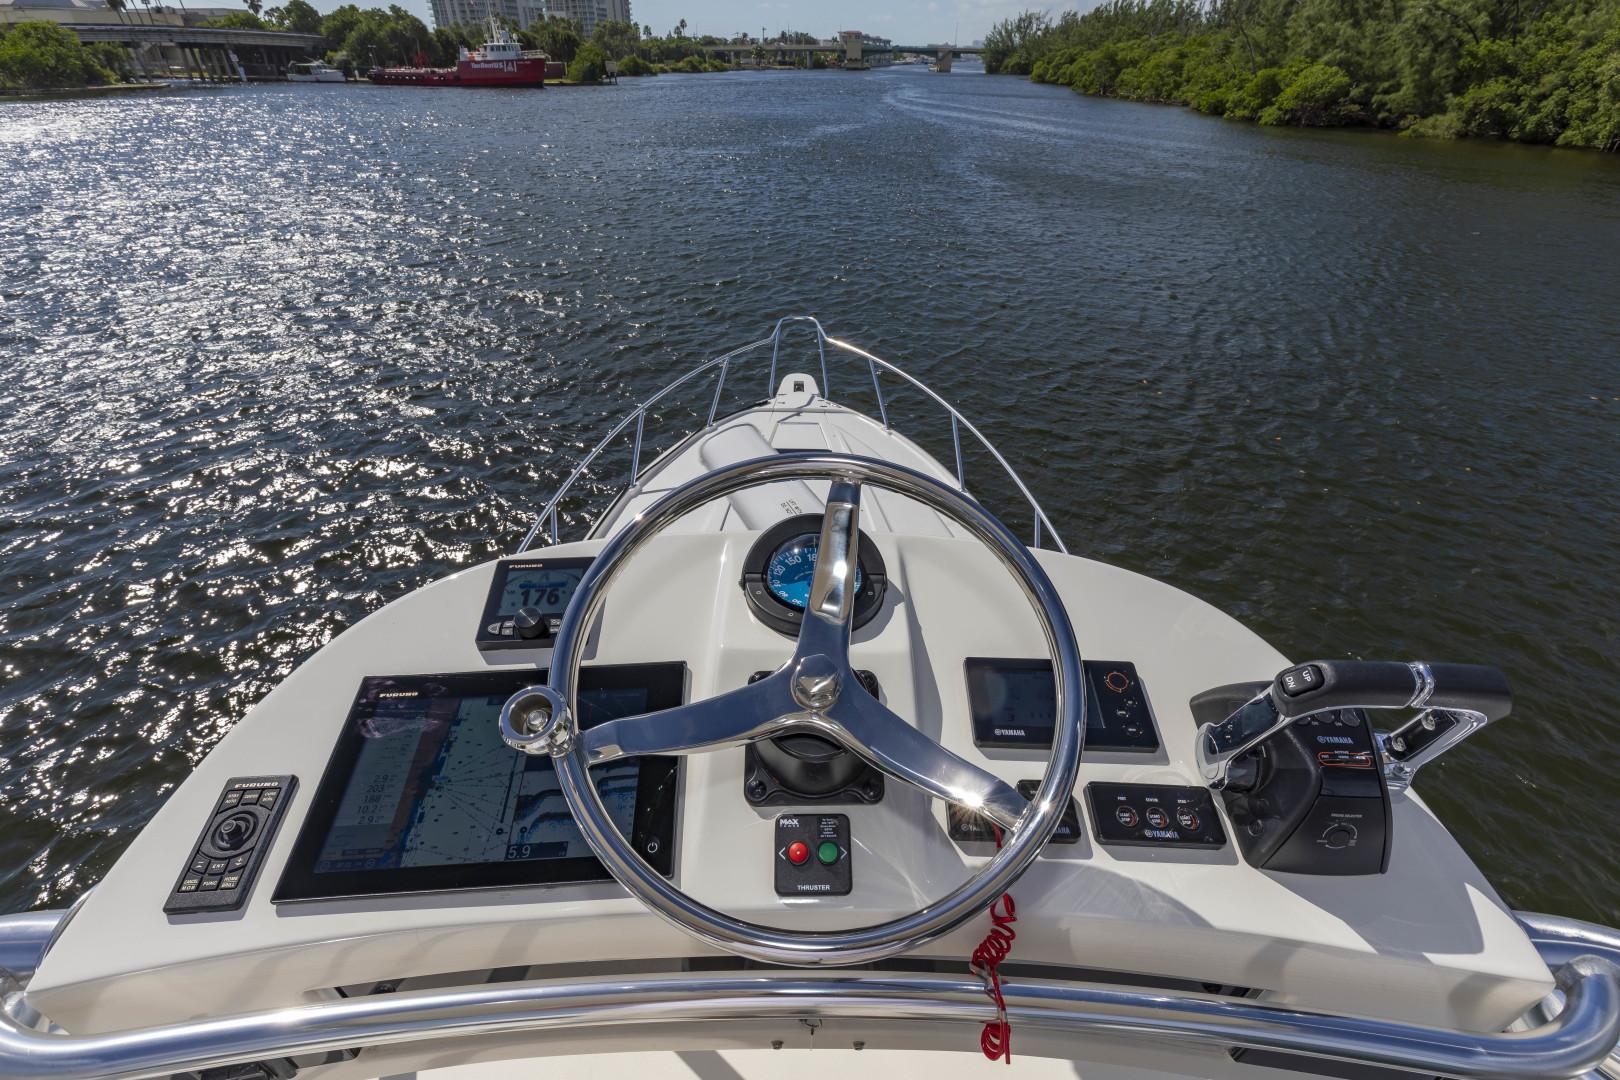 Intrepid-377 Walkaround 2005-Rock Boat REFIT 2018 Dania Beach-Florida-United States-377 Intrepid Tower 1-1511558 | Thumbnail